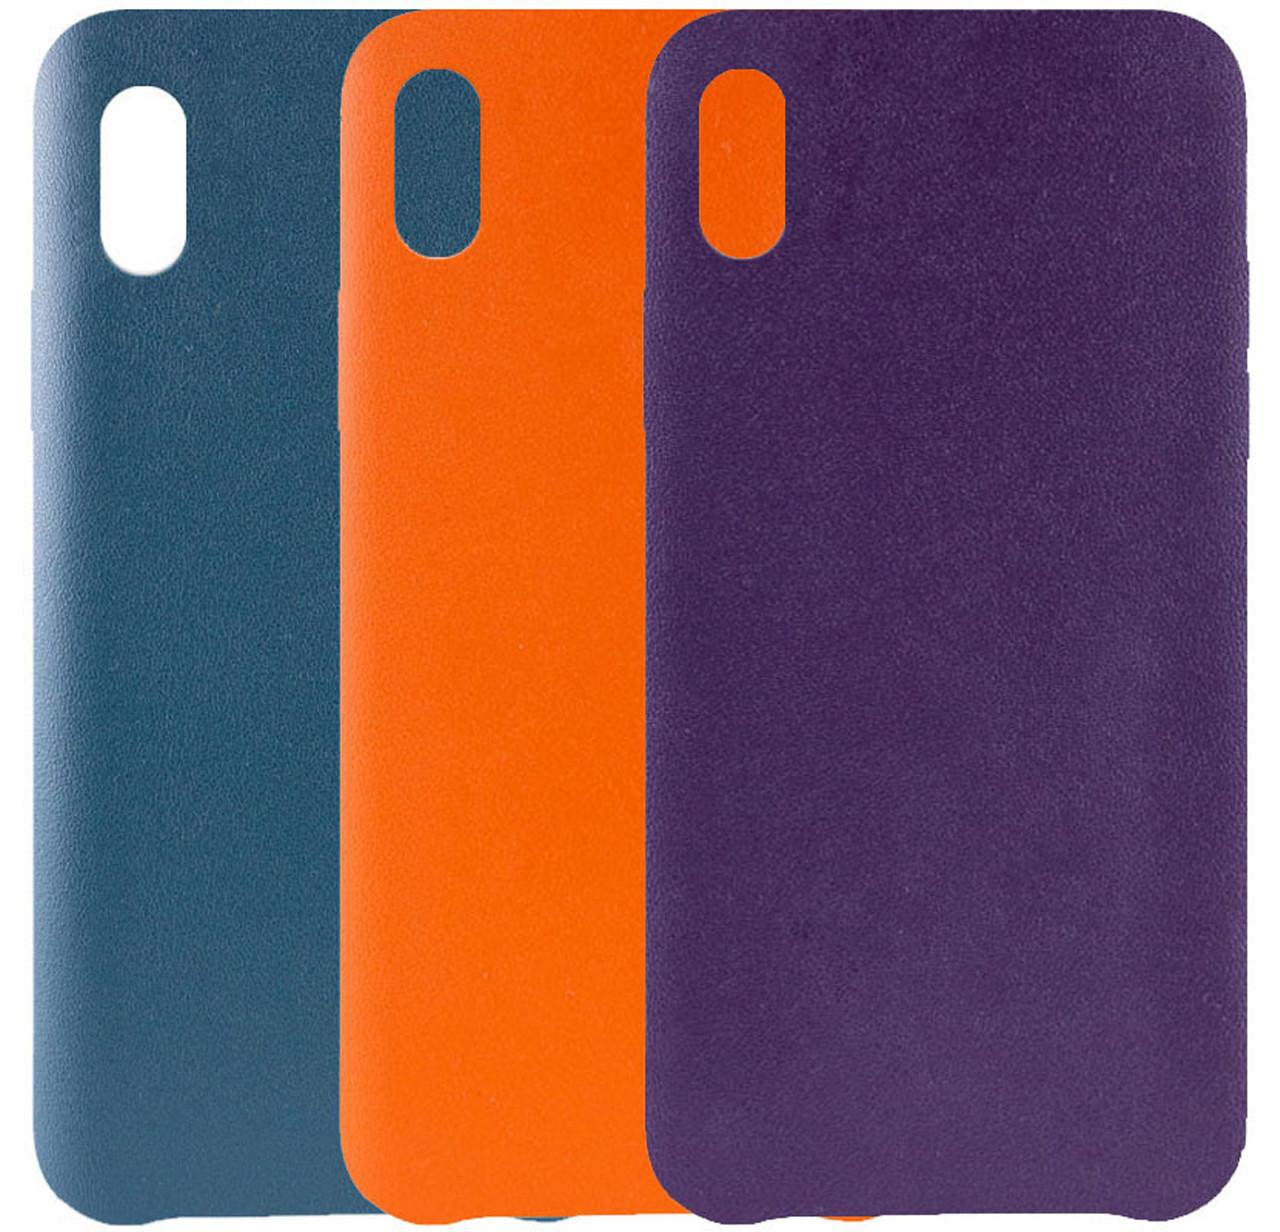 Кожаный чехол AHIMSA PU Leather Case для IPhone Xr